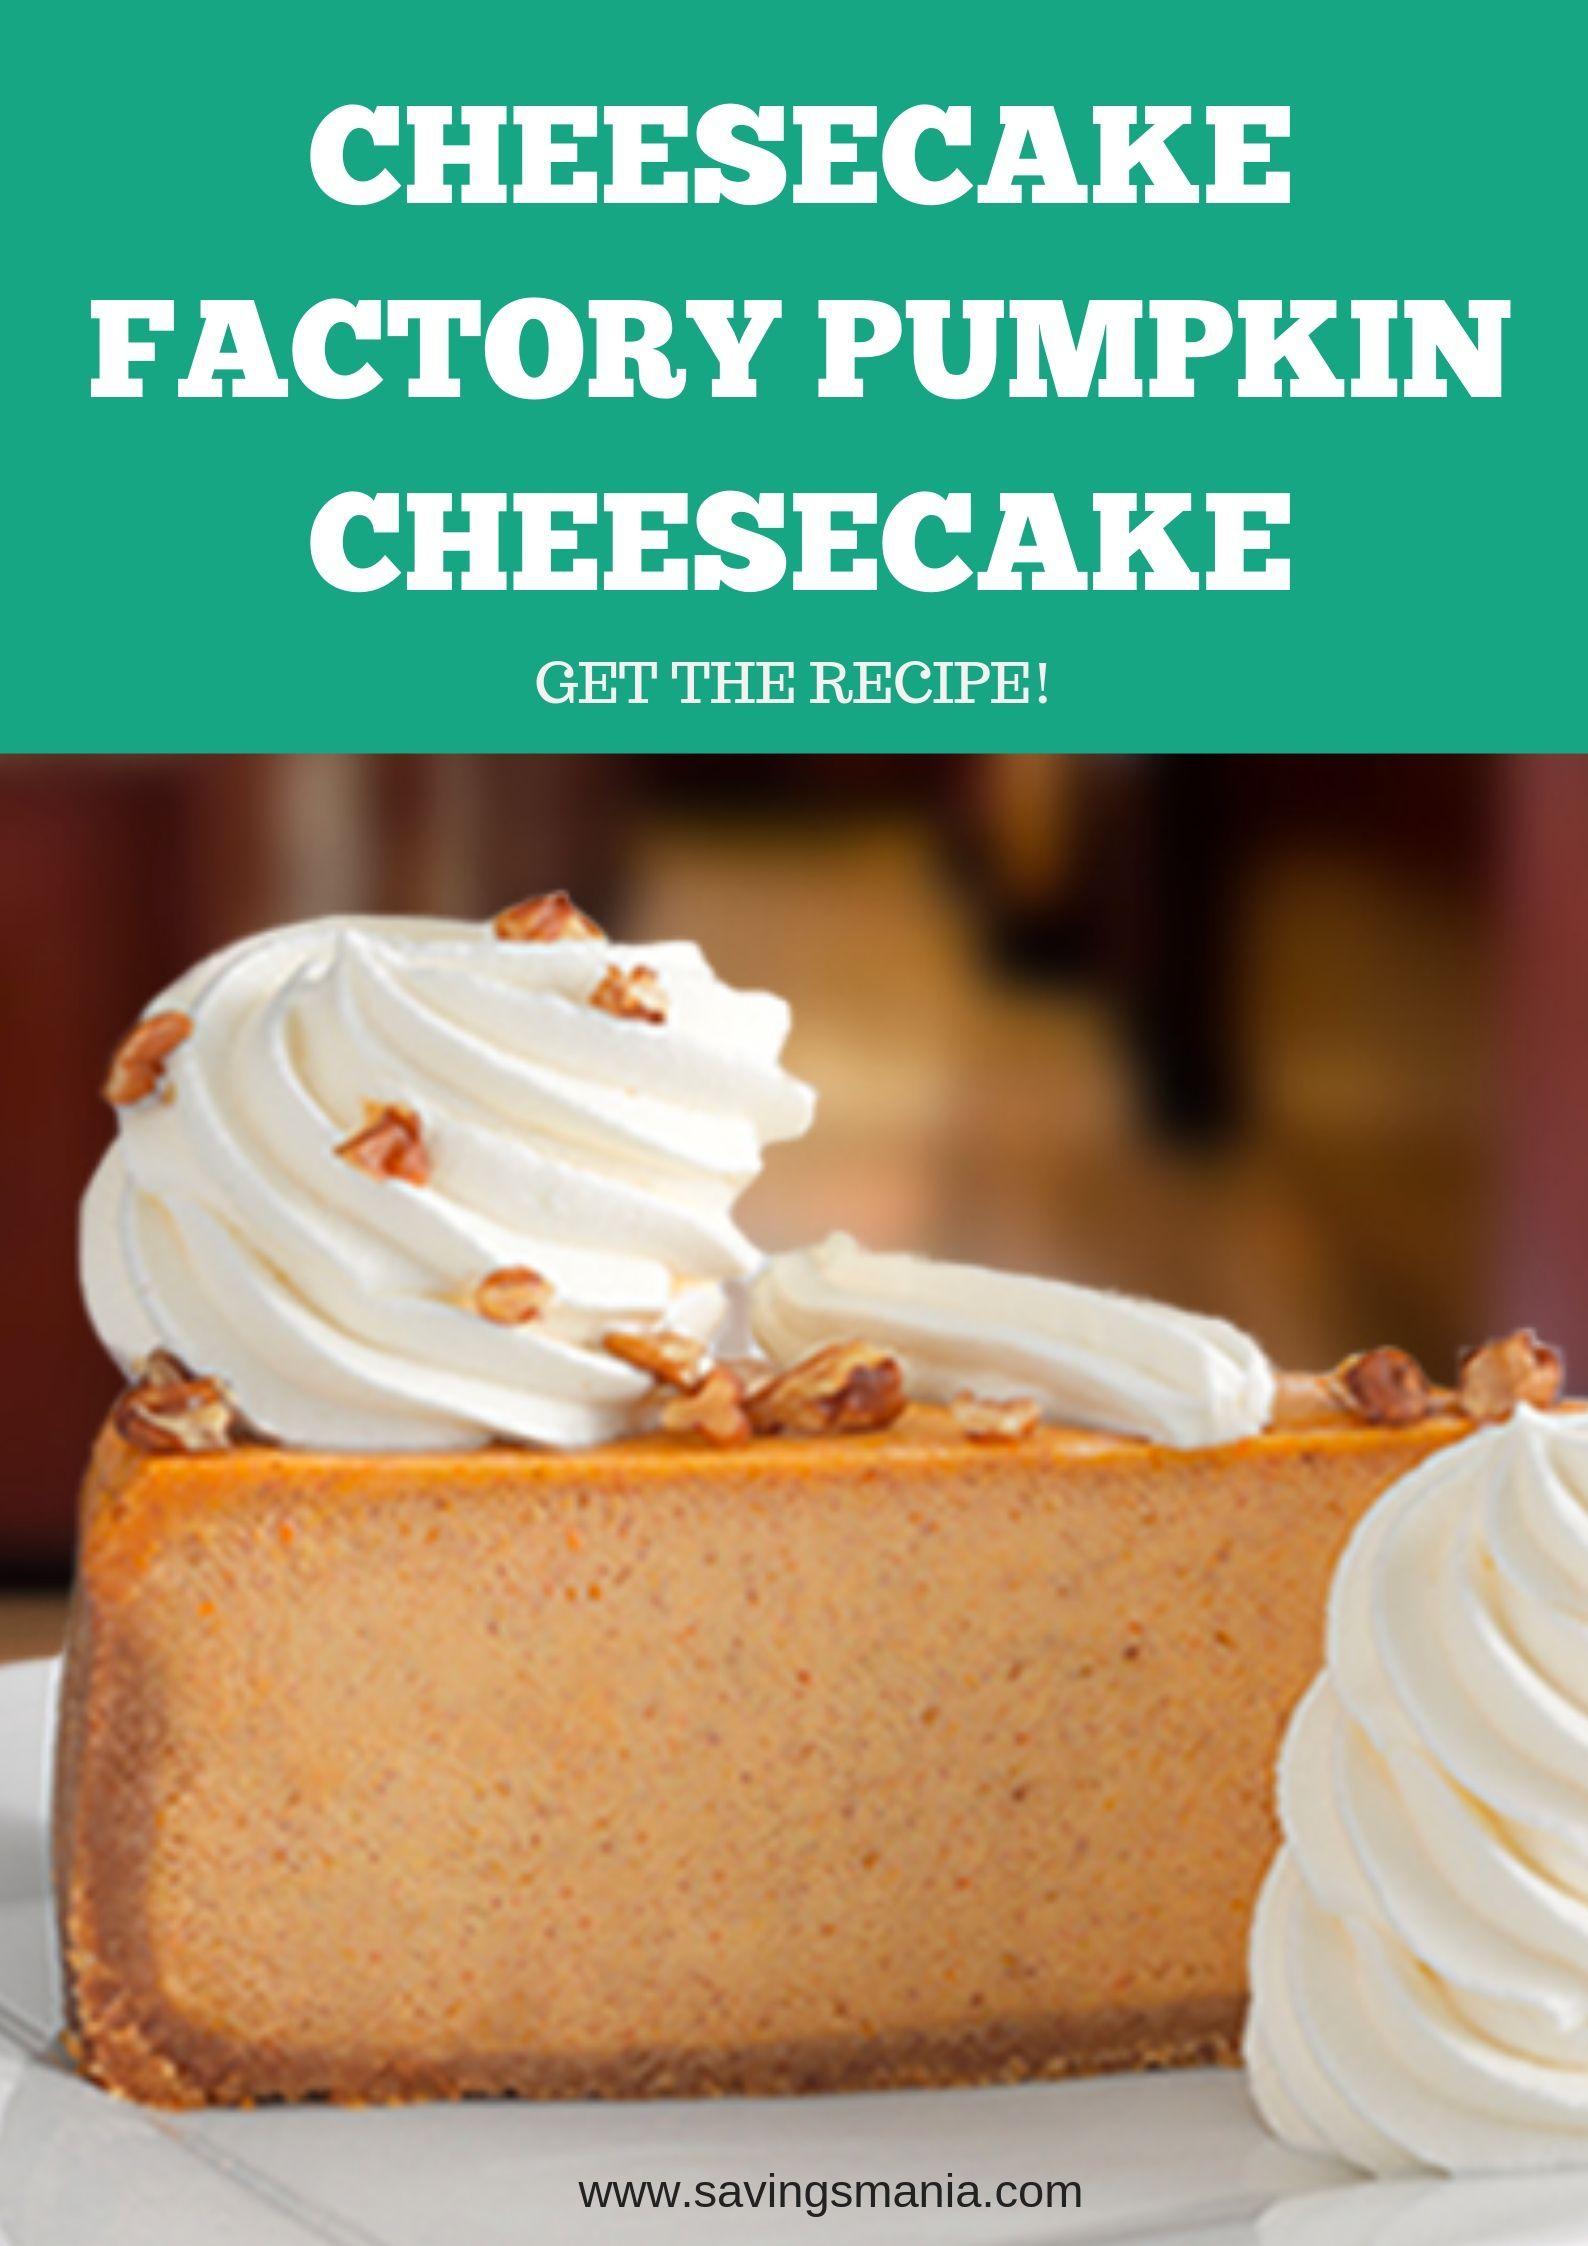 Cheesecake Factory Pumpkin Cheesecake CopycatRecipe - Recipes - SavingsMania